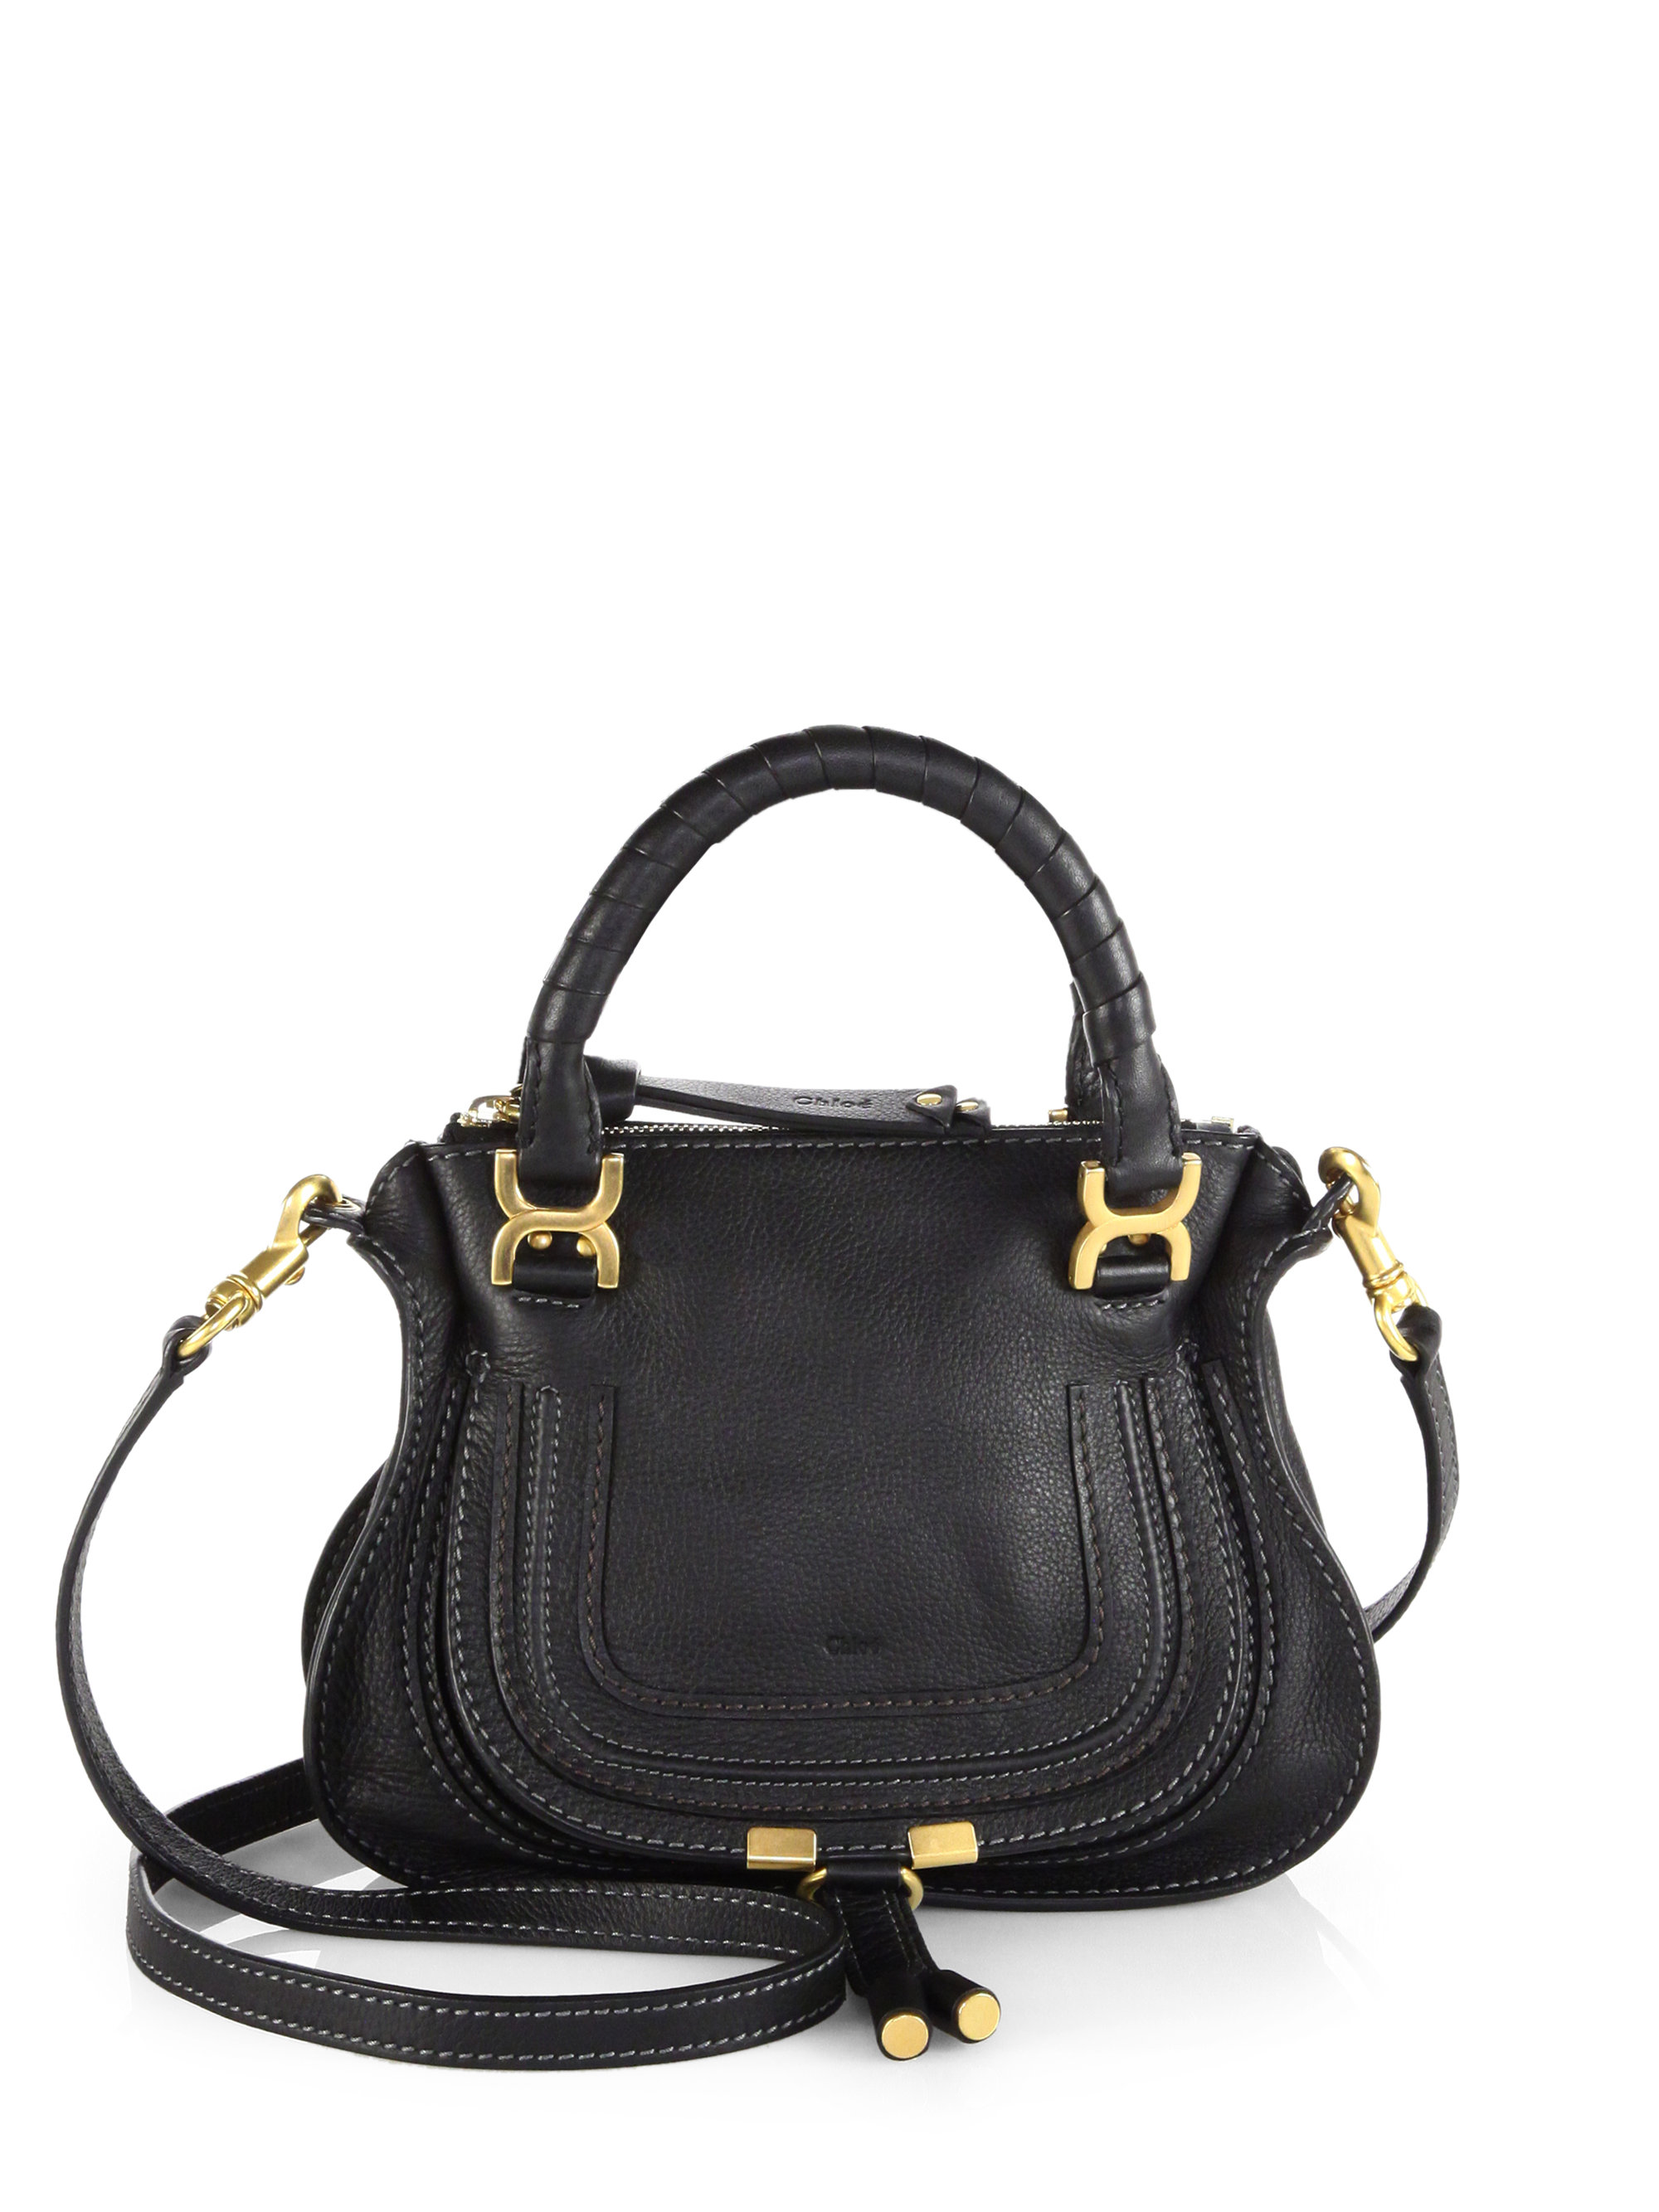 chlo marcie mini crossbody bag in black lyst. Black Bedroom Furniture Sets. Home Design Ideas